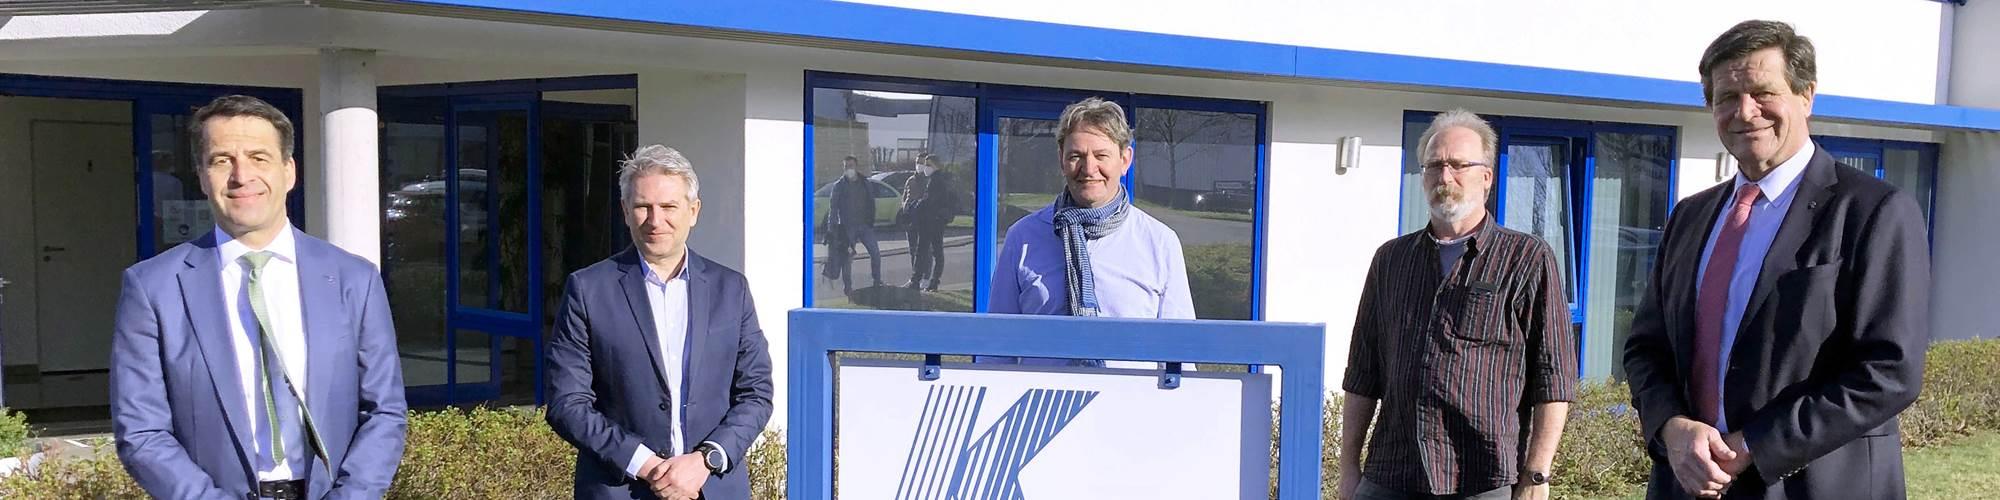 De izquierda a derecha: Bernd Reifenhäuser (CEO, Reifenhäuser Group); Richard Zimmermann (director de Kdesign);Gerd Fähling (jefe de ventas de Kdesign);Joachim Lange (de Kdesign); y Ulrich Reifenhäuser (CSO, de Reifenhäuser Group).